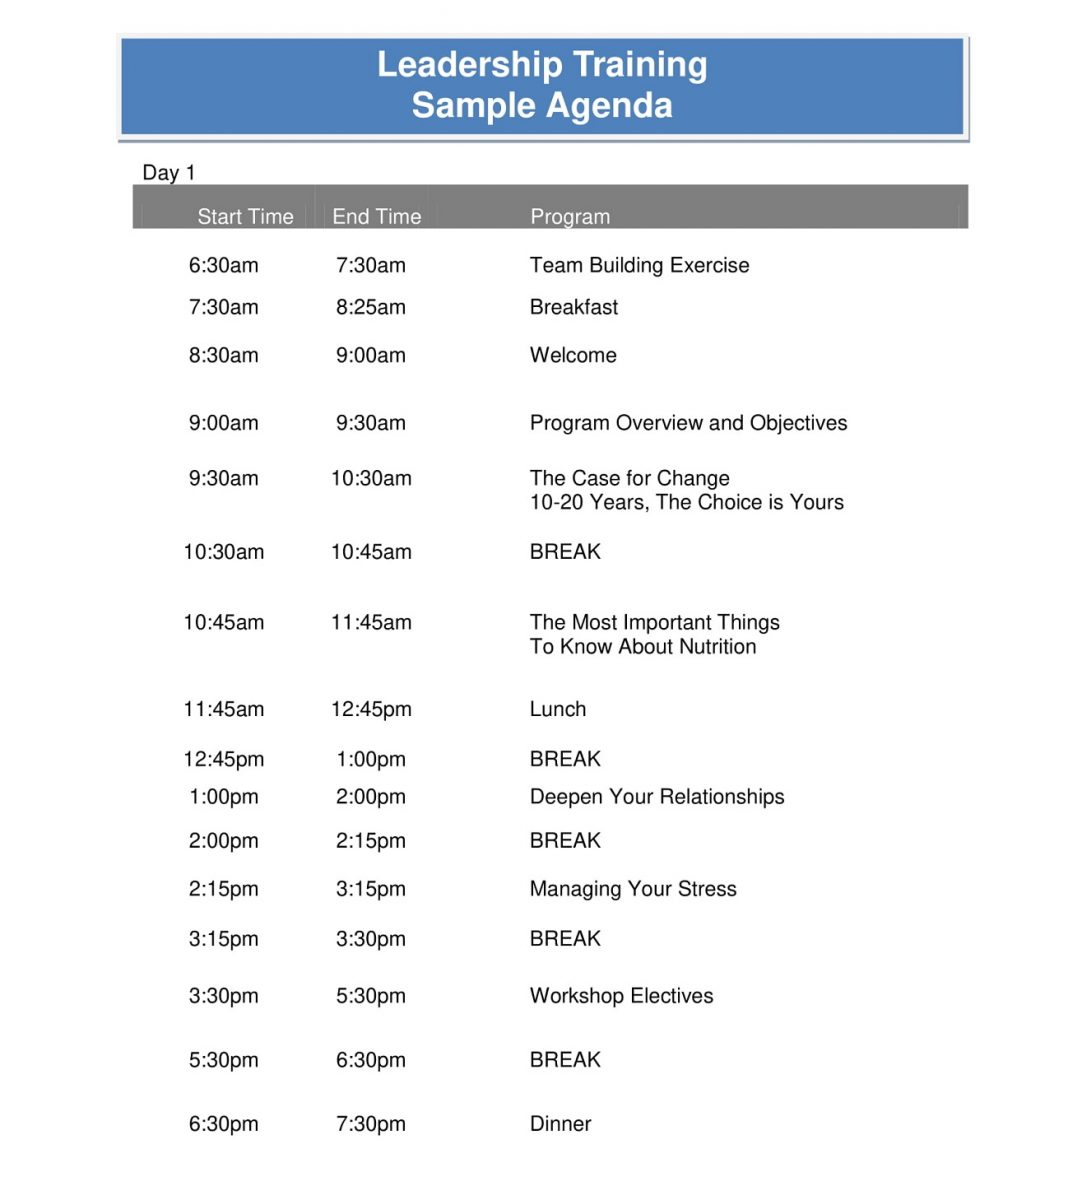 Leadership Training Agenda Sample PDF Template Microsoft Word Ppt How To Create A Pdf Layout  Large